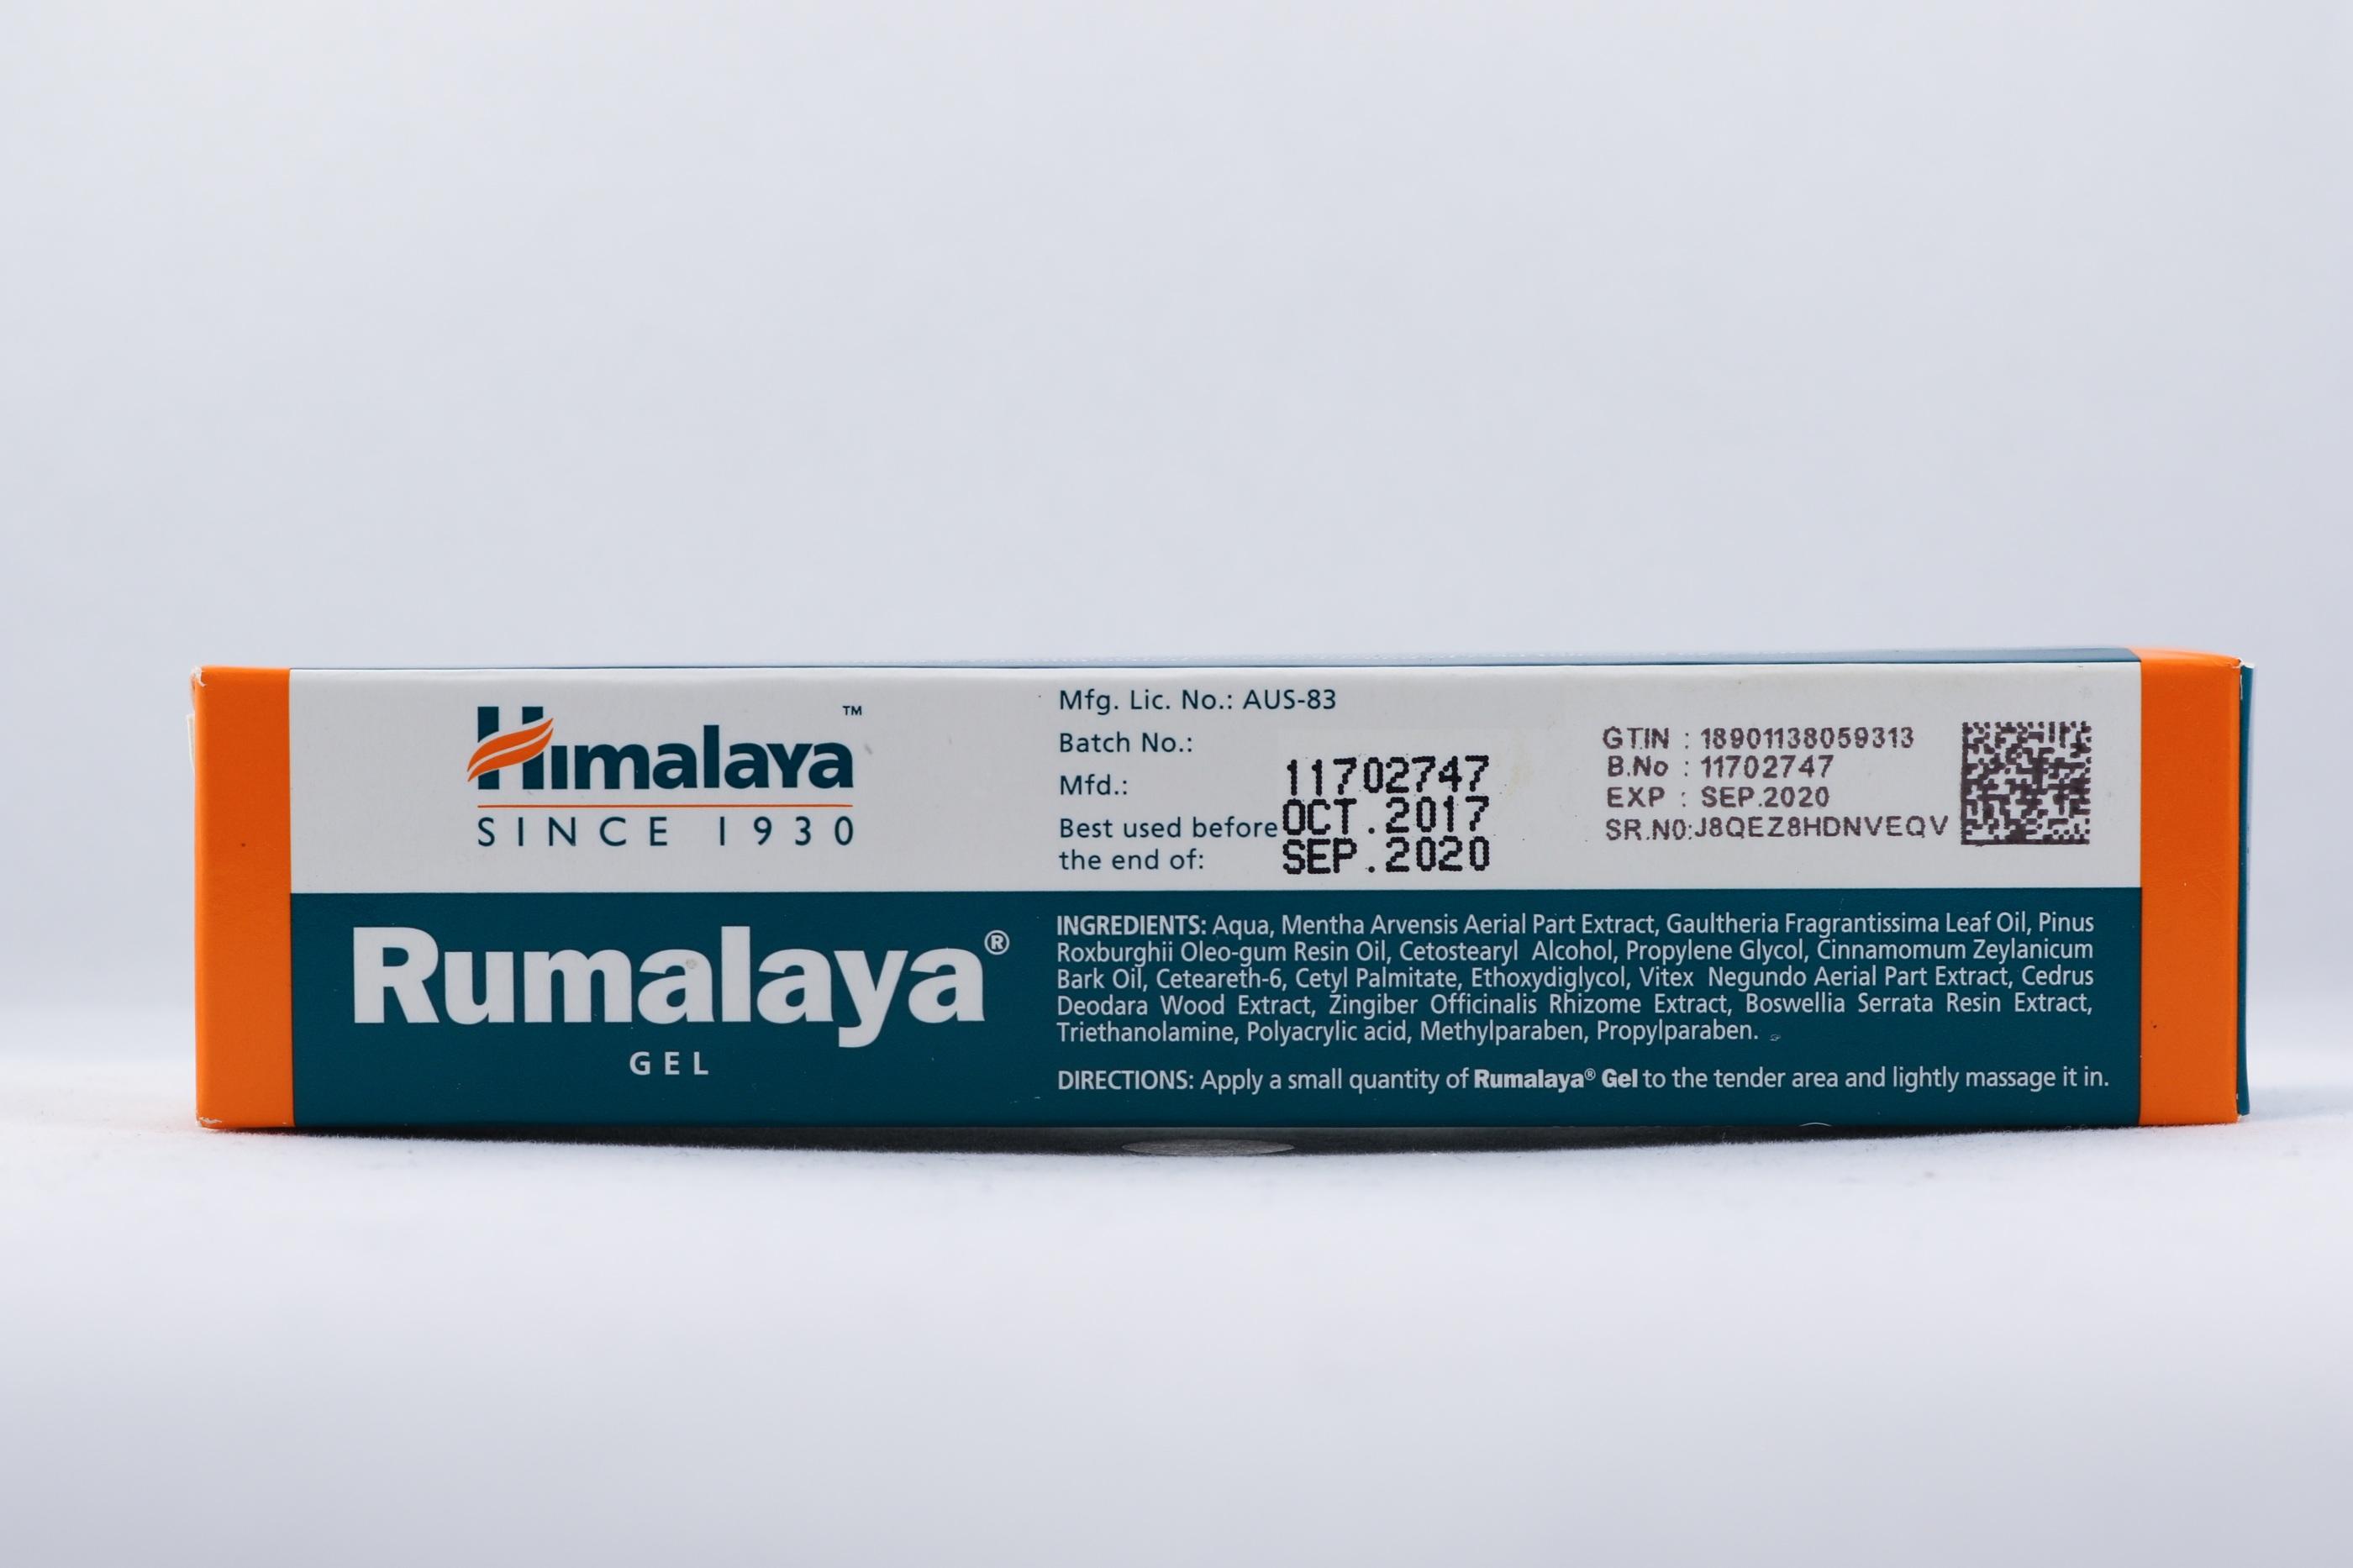 Rumalaya gel wellness ayurveda  halmstad sweden svensk hudvård